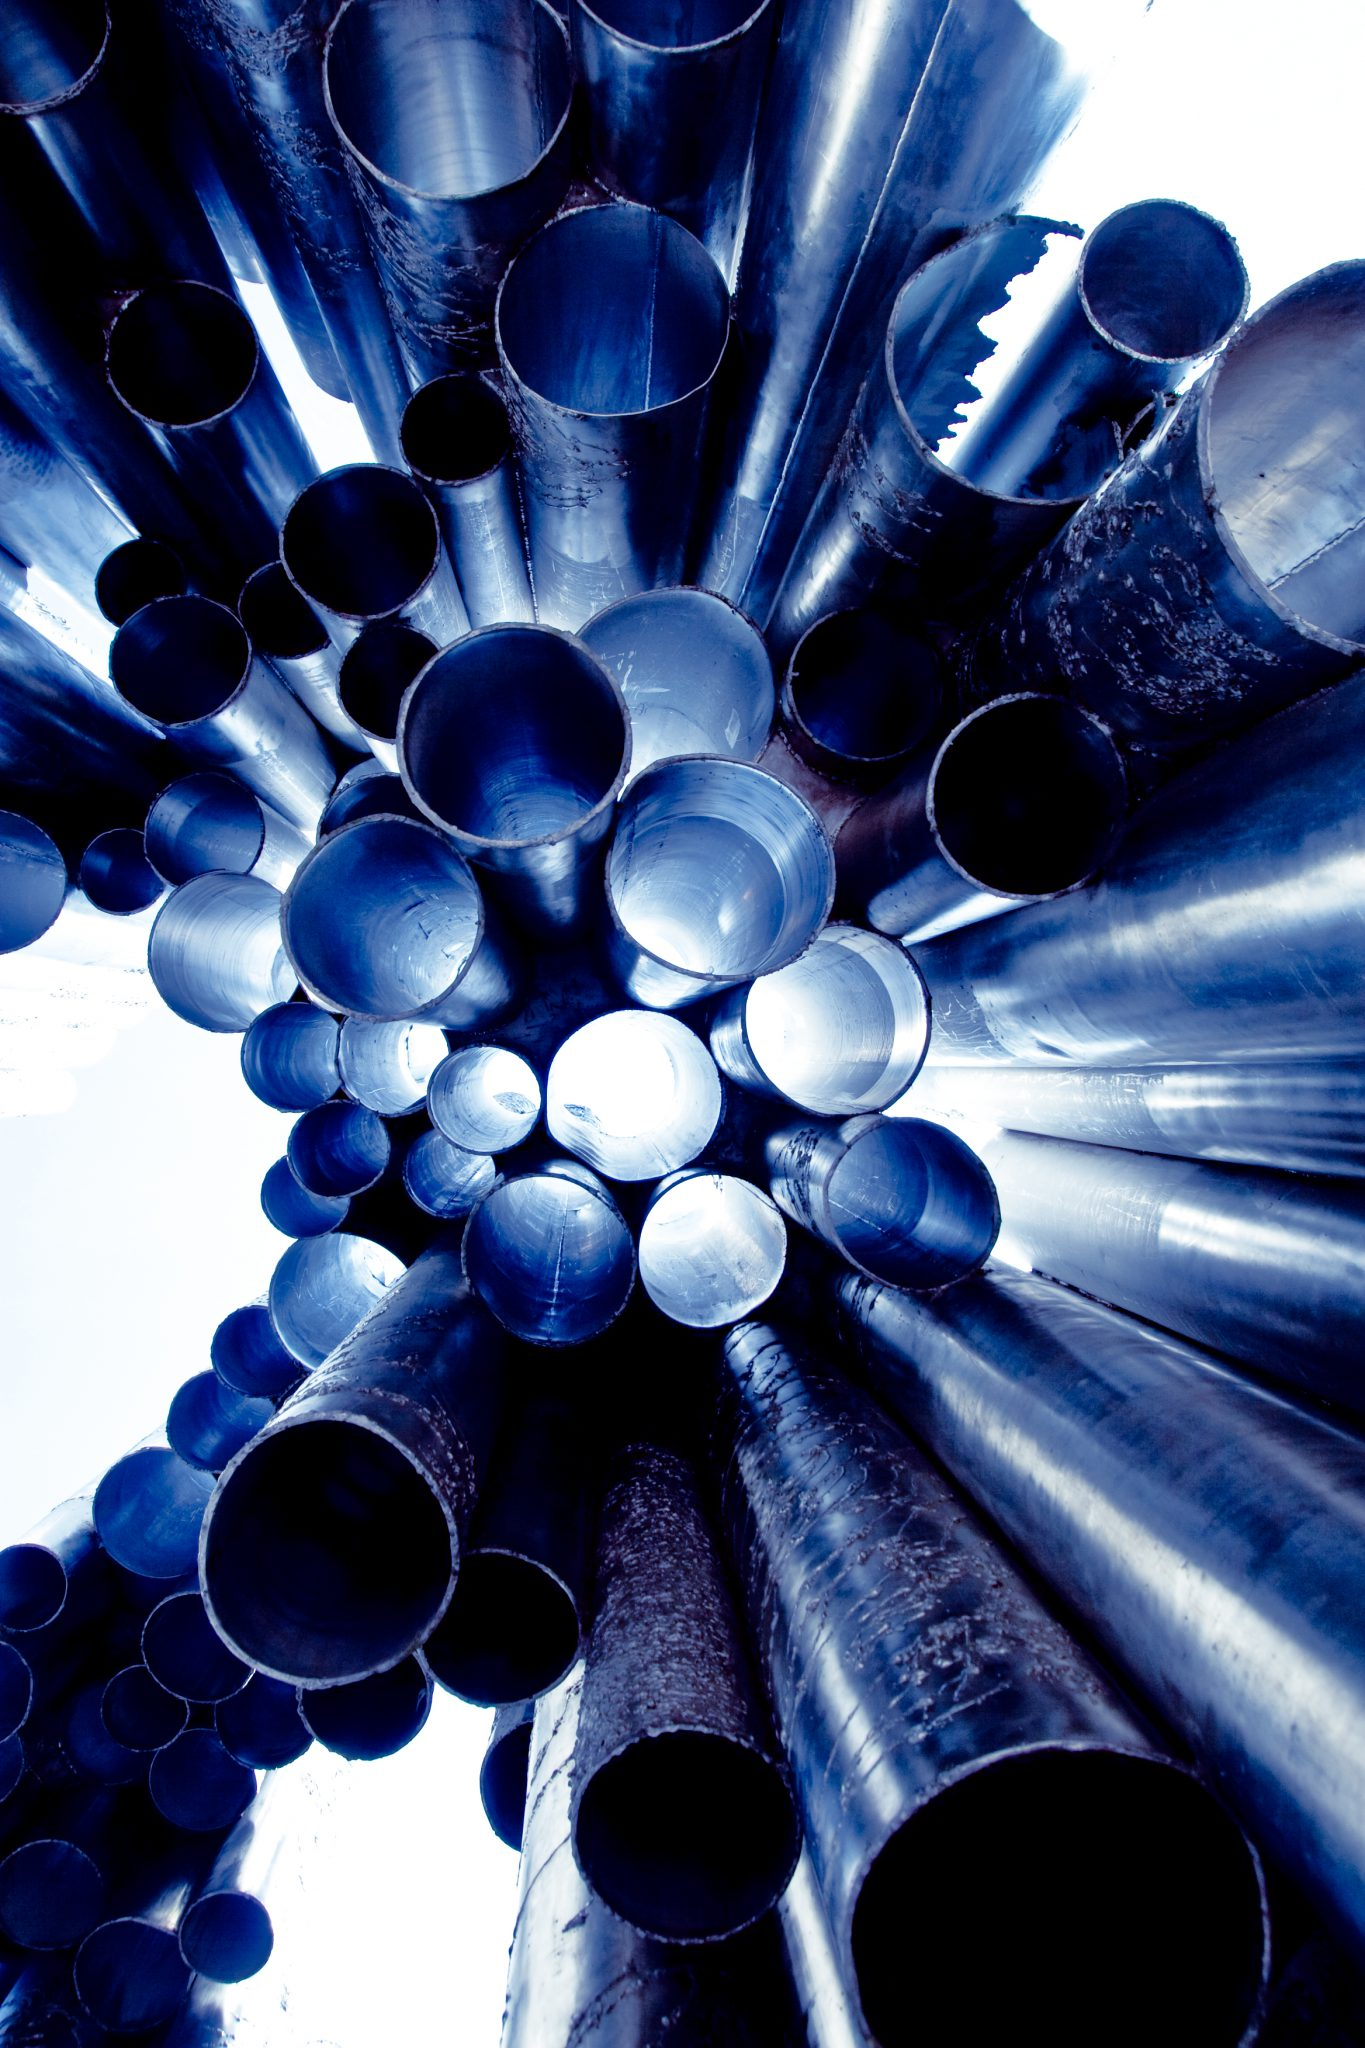 Metal_poles